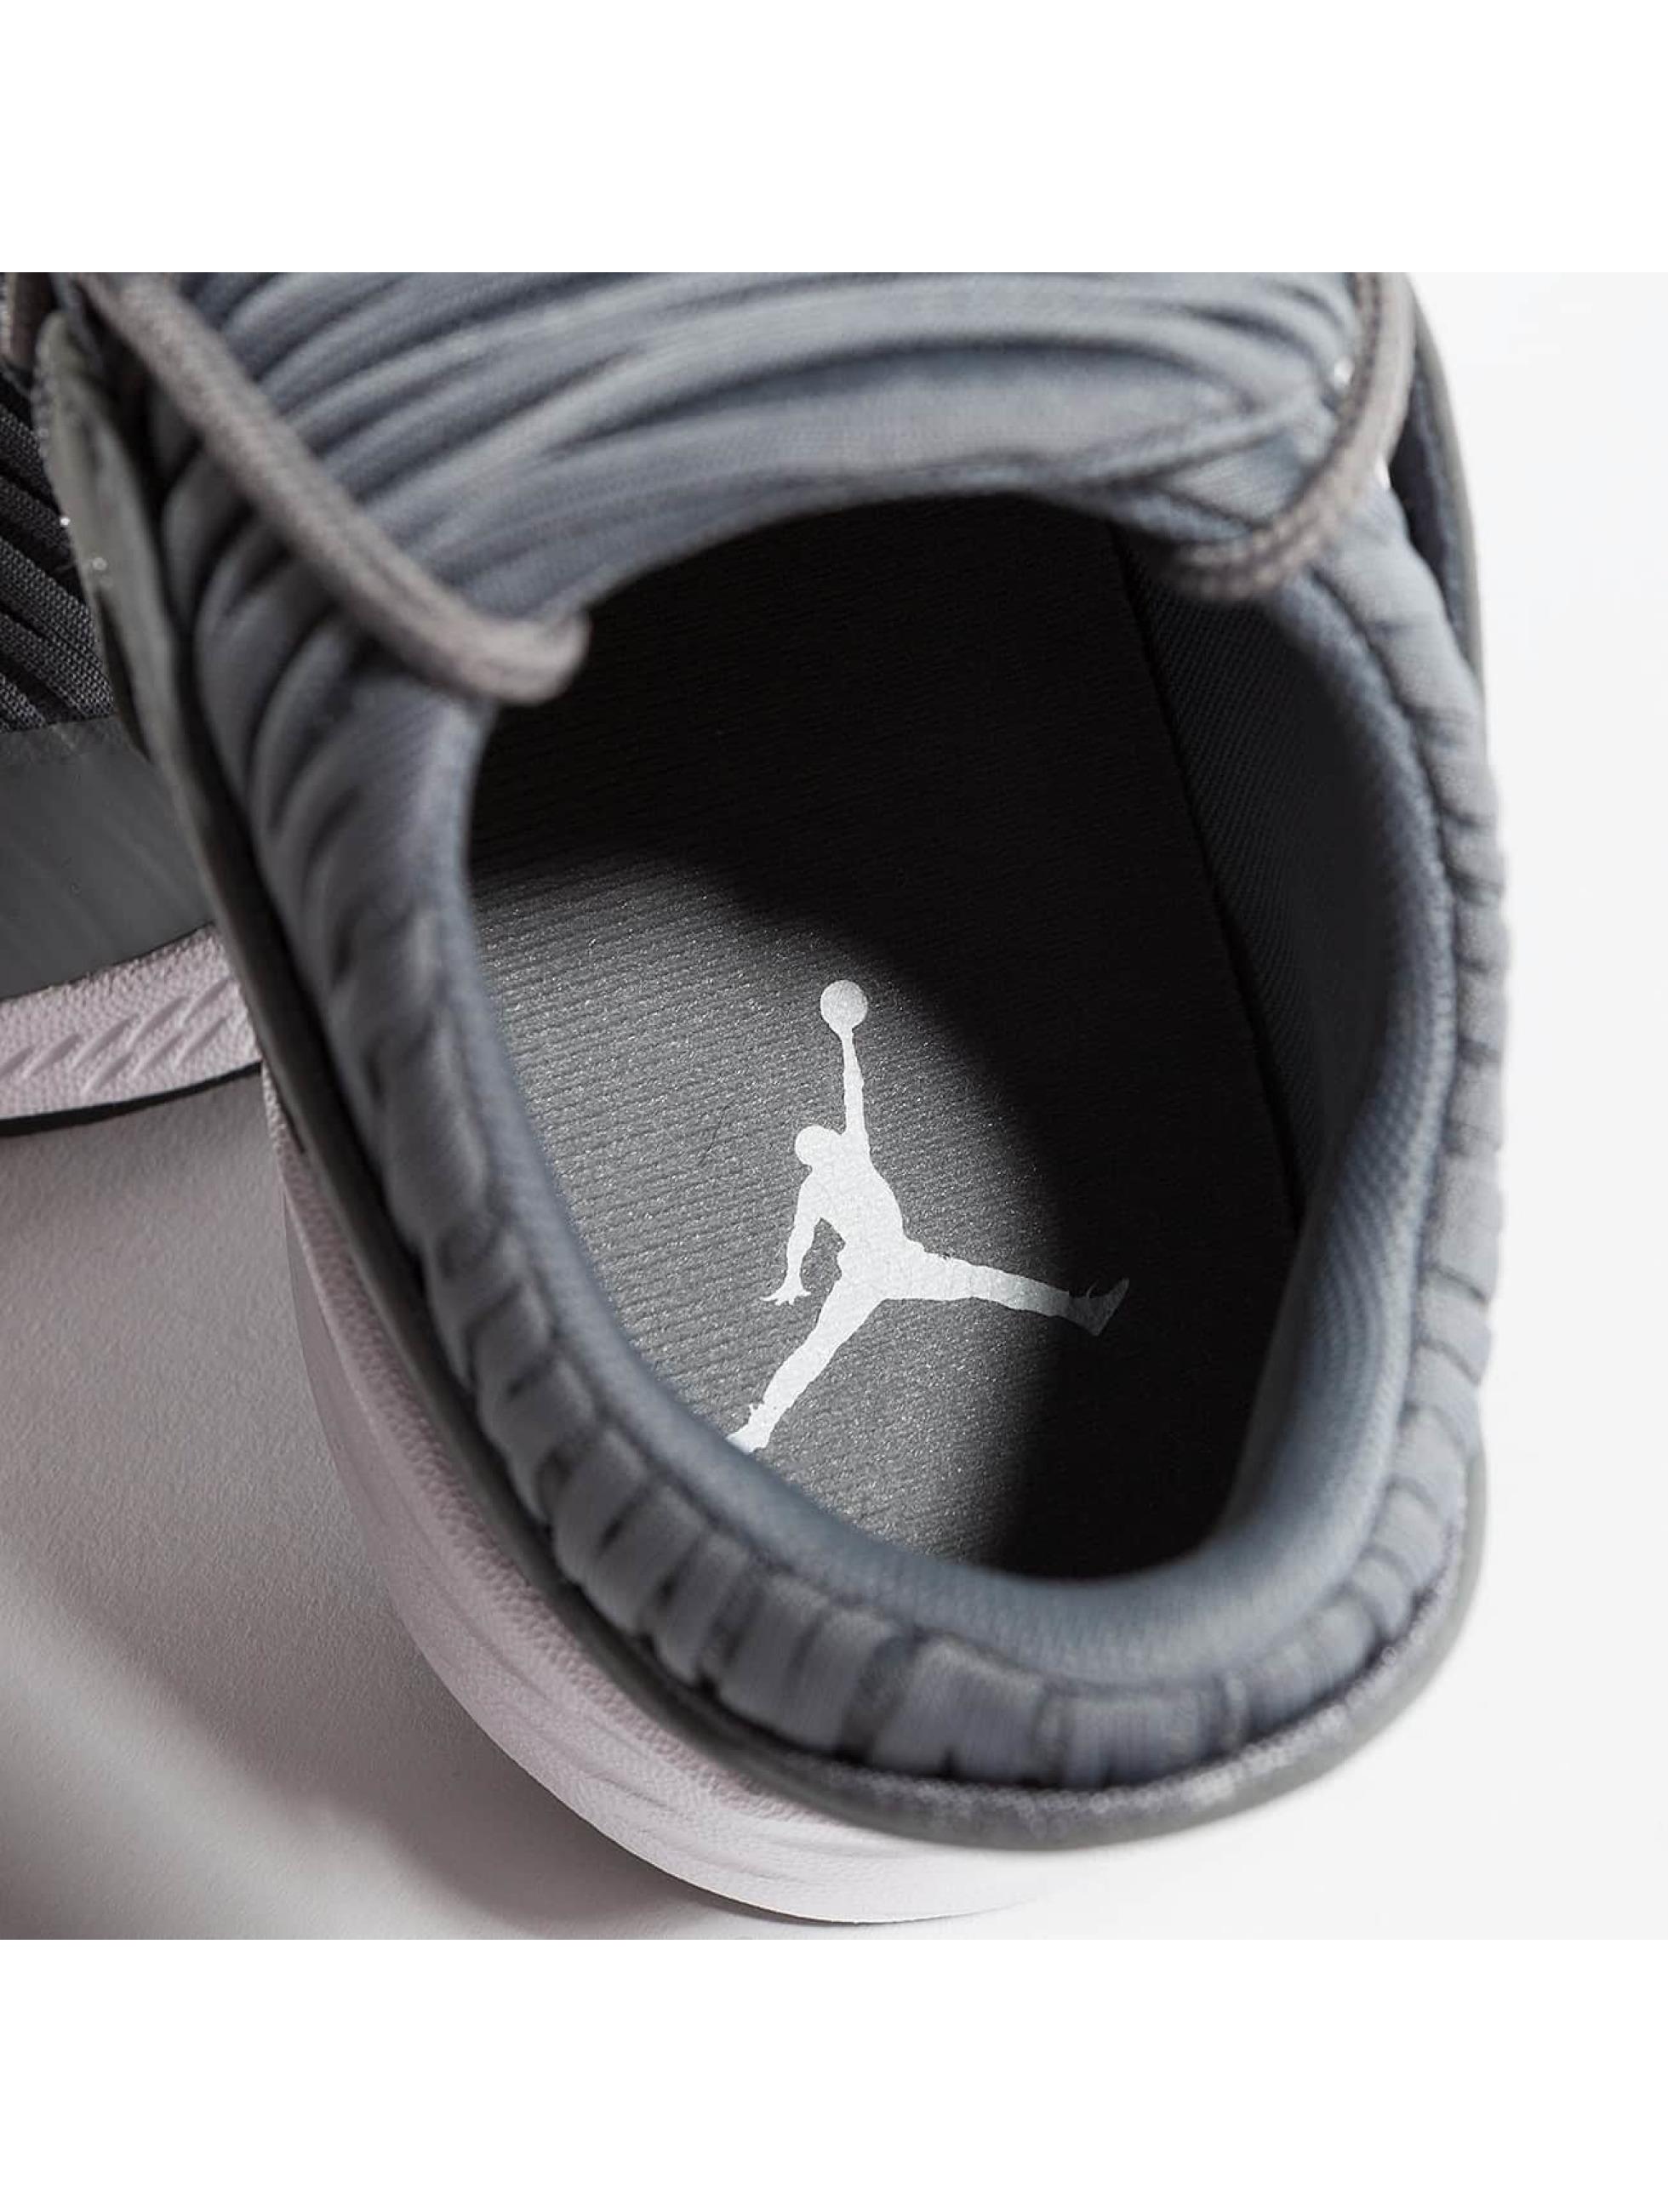 Jordan Sneakers Formula 23 Low šedá